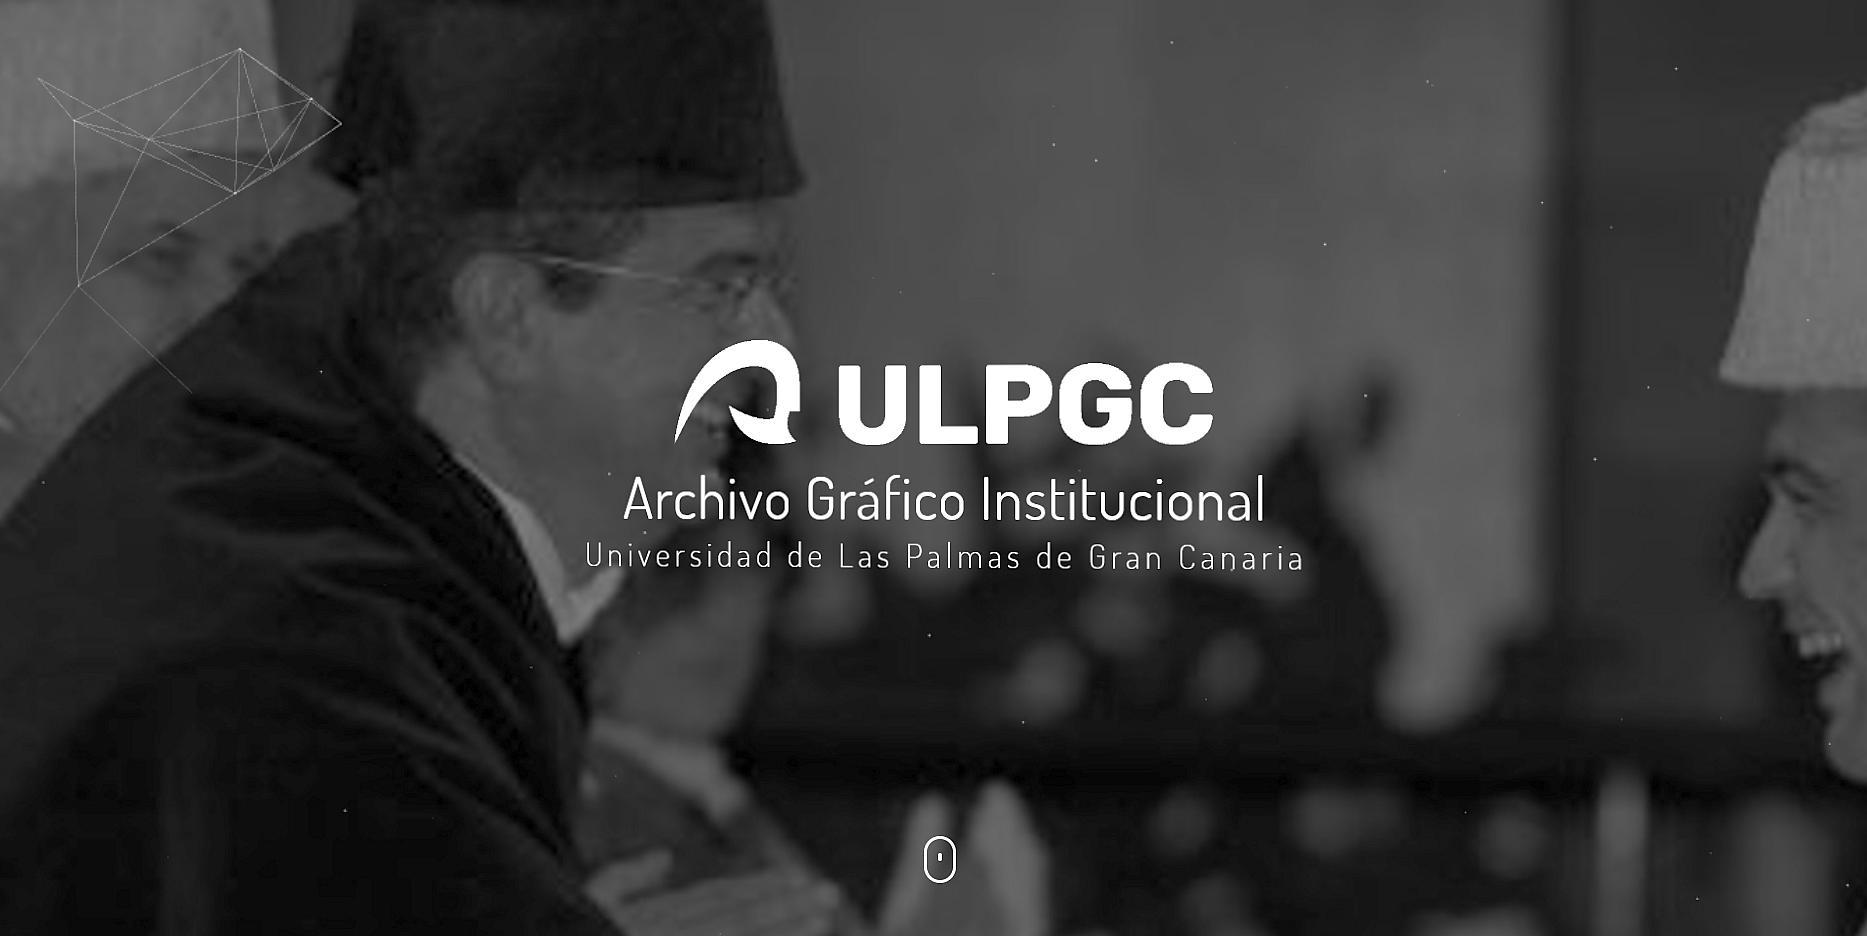 Archivo gráfico institucional de la ULPGC